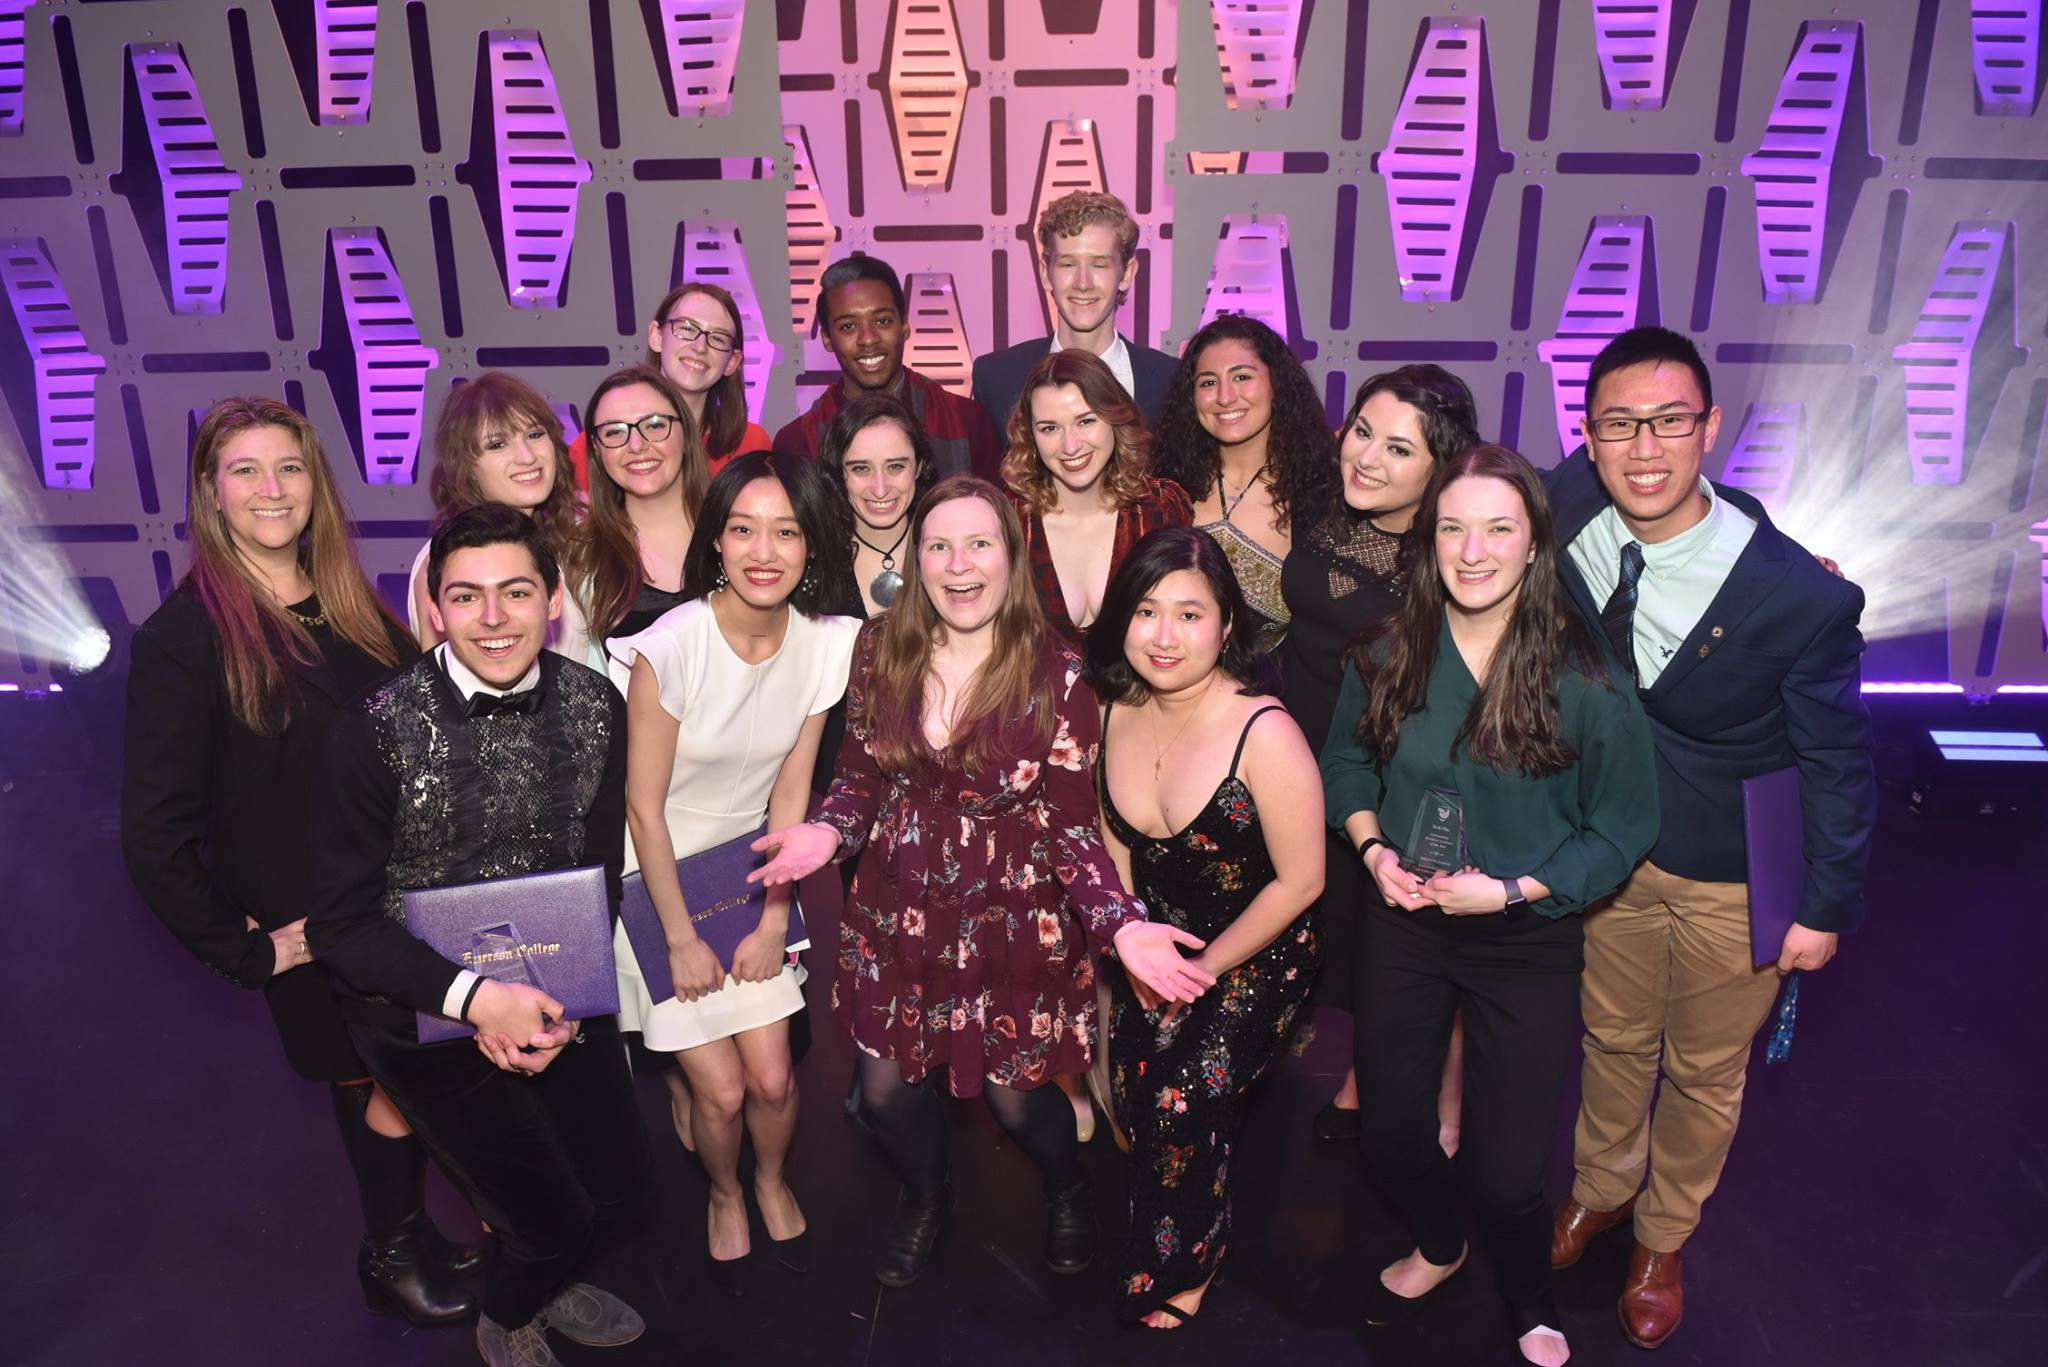 SGA 2017-2018 at the 2018 Emerson Recognition & Achievement Awards